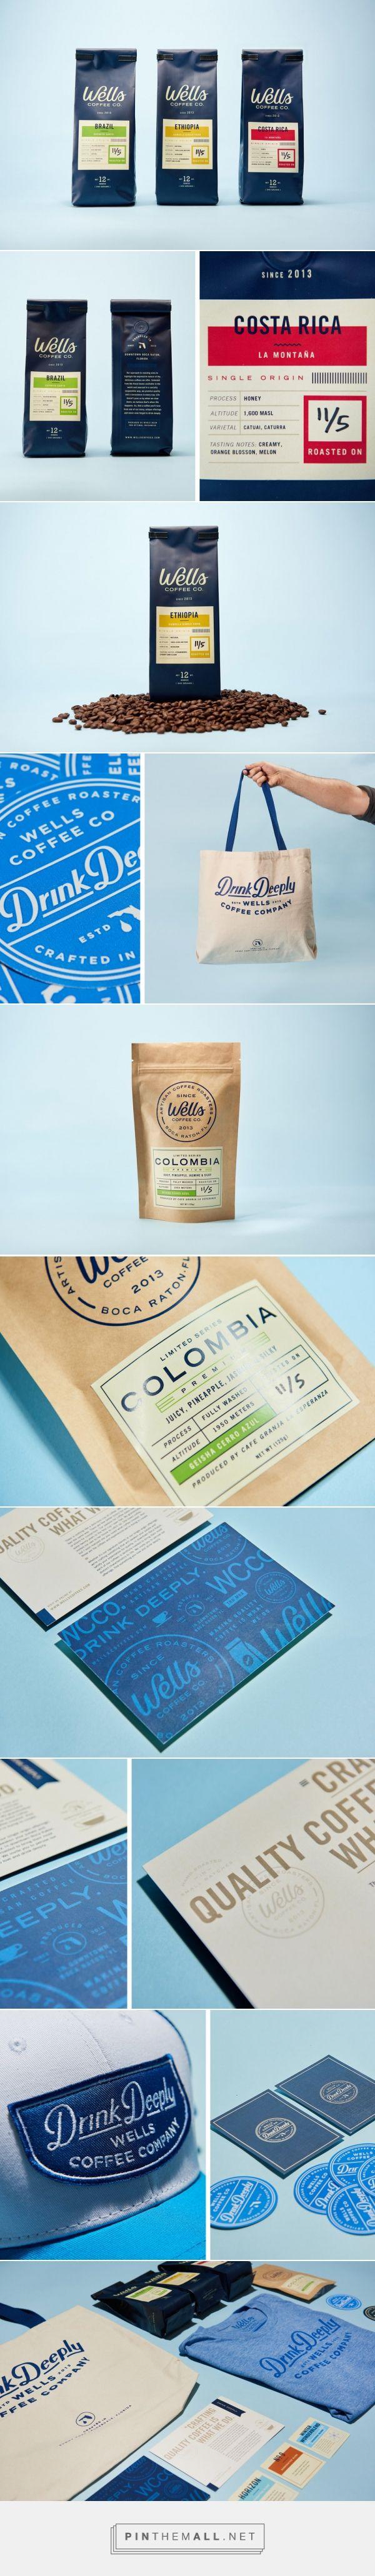 Wells Coffee Co. — Steve Wolf Designs - created via https://pinthemall.net